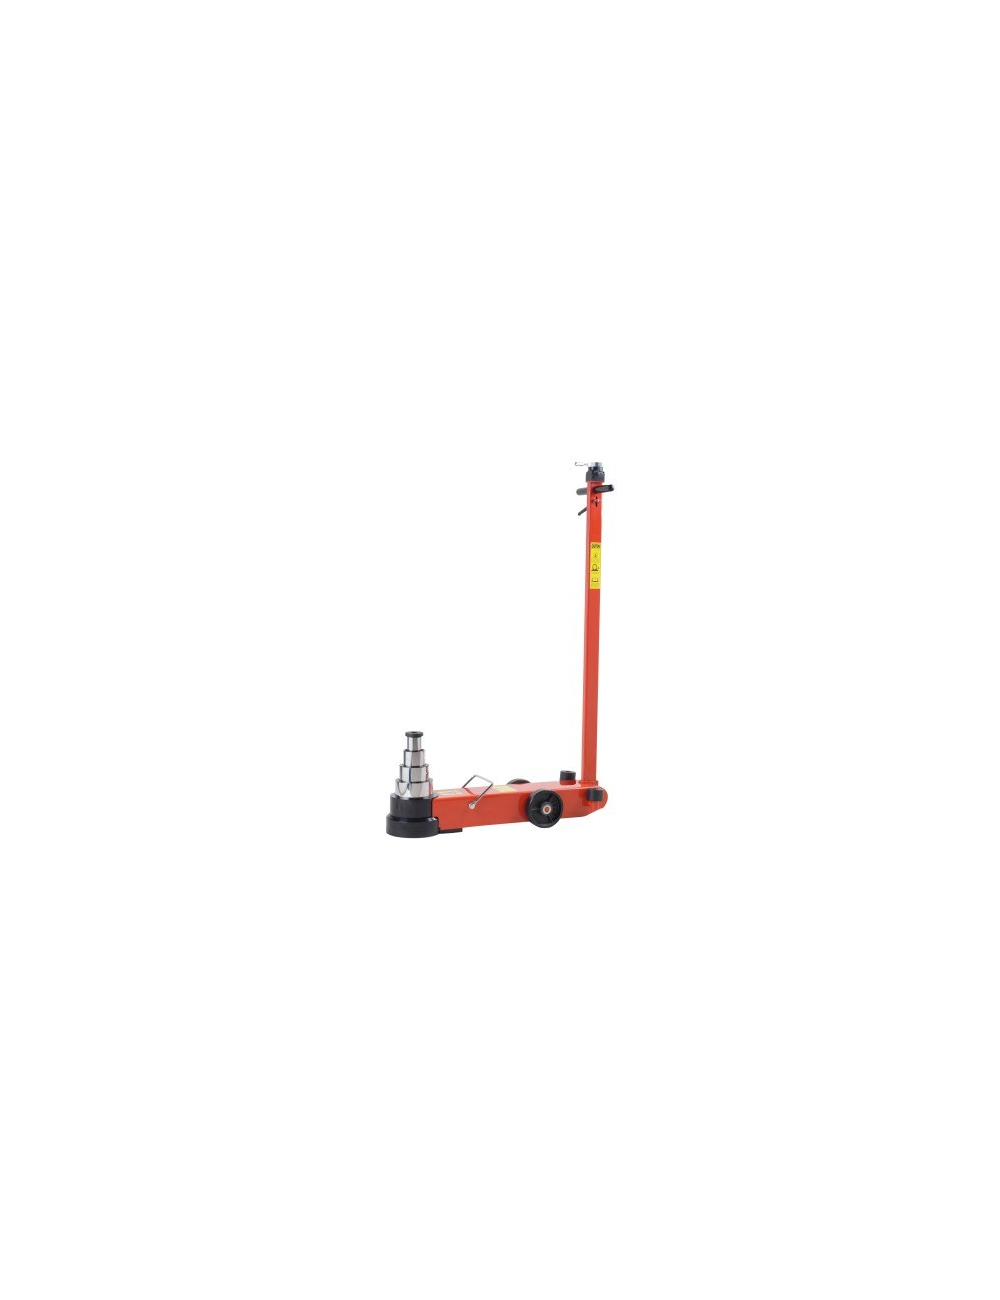 Cric hydropneumatique 60t/40t/22t/11t 0,8-1,2Mpa